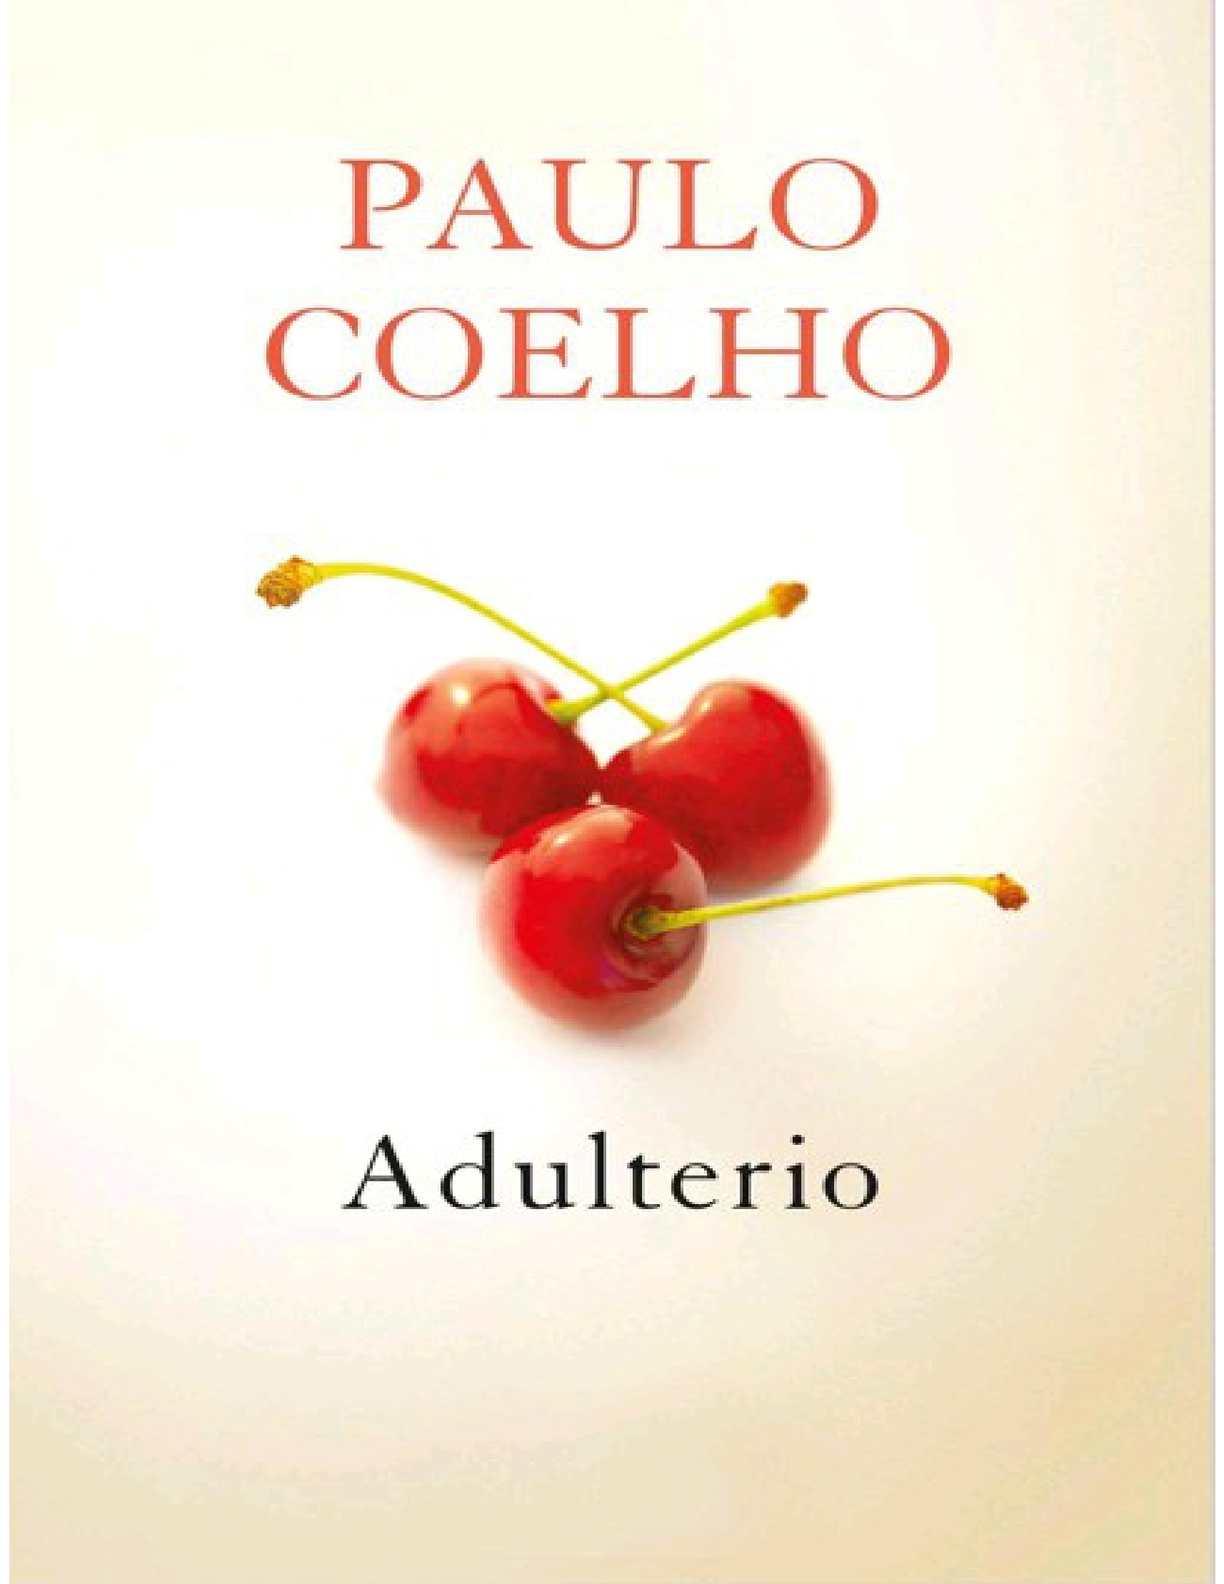 Adulterio Novela Videos Porno calaméo - paulo coelho adulterio[1]